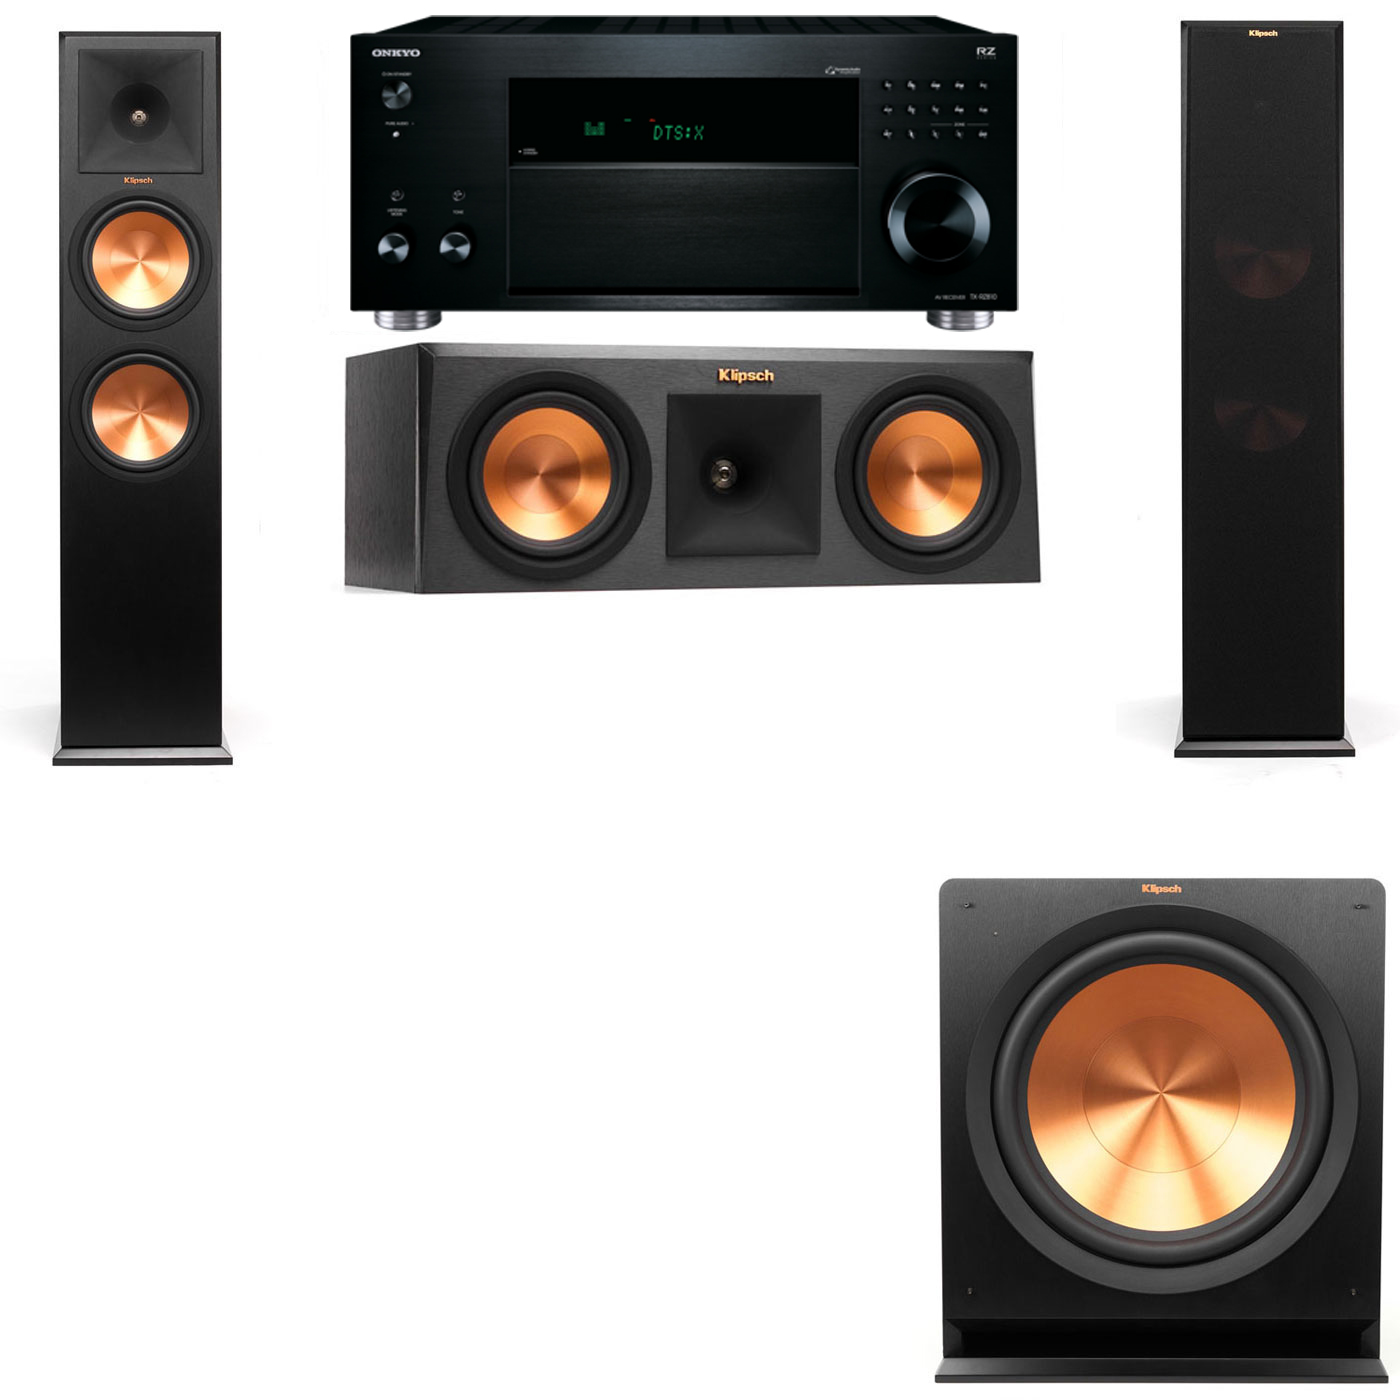 Klipsch RP-280F Tower Speakers-RP-250C-3.1-Onkyo TX-RZ810